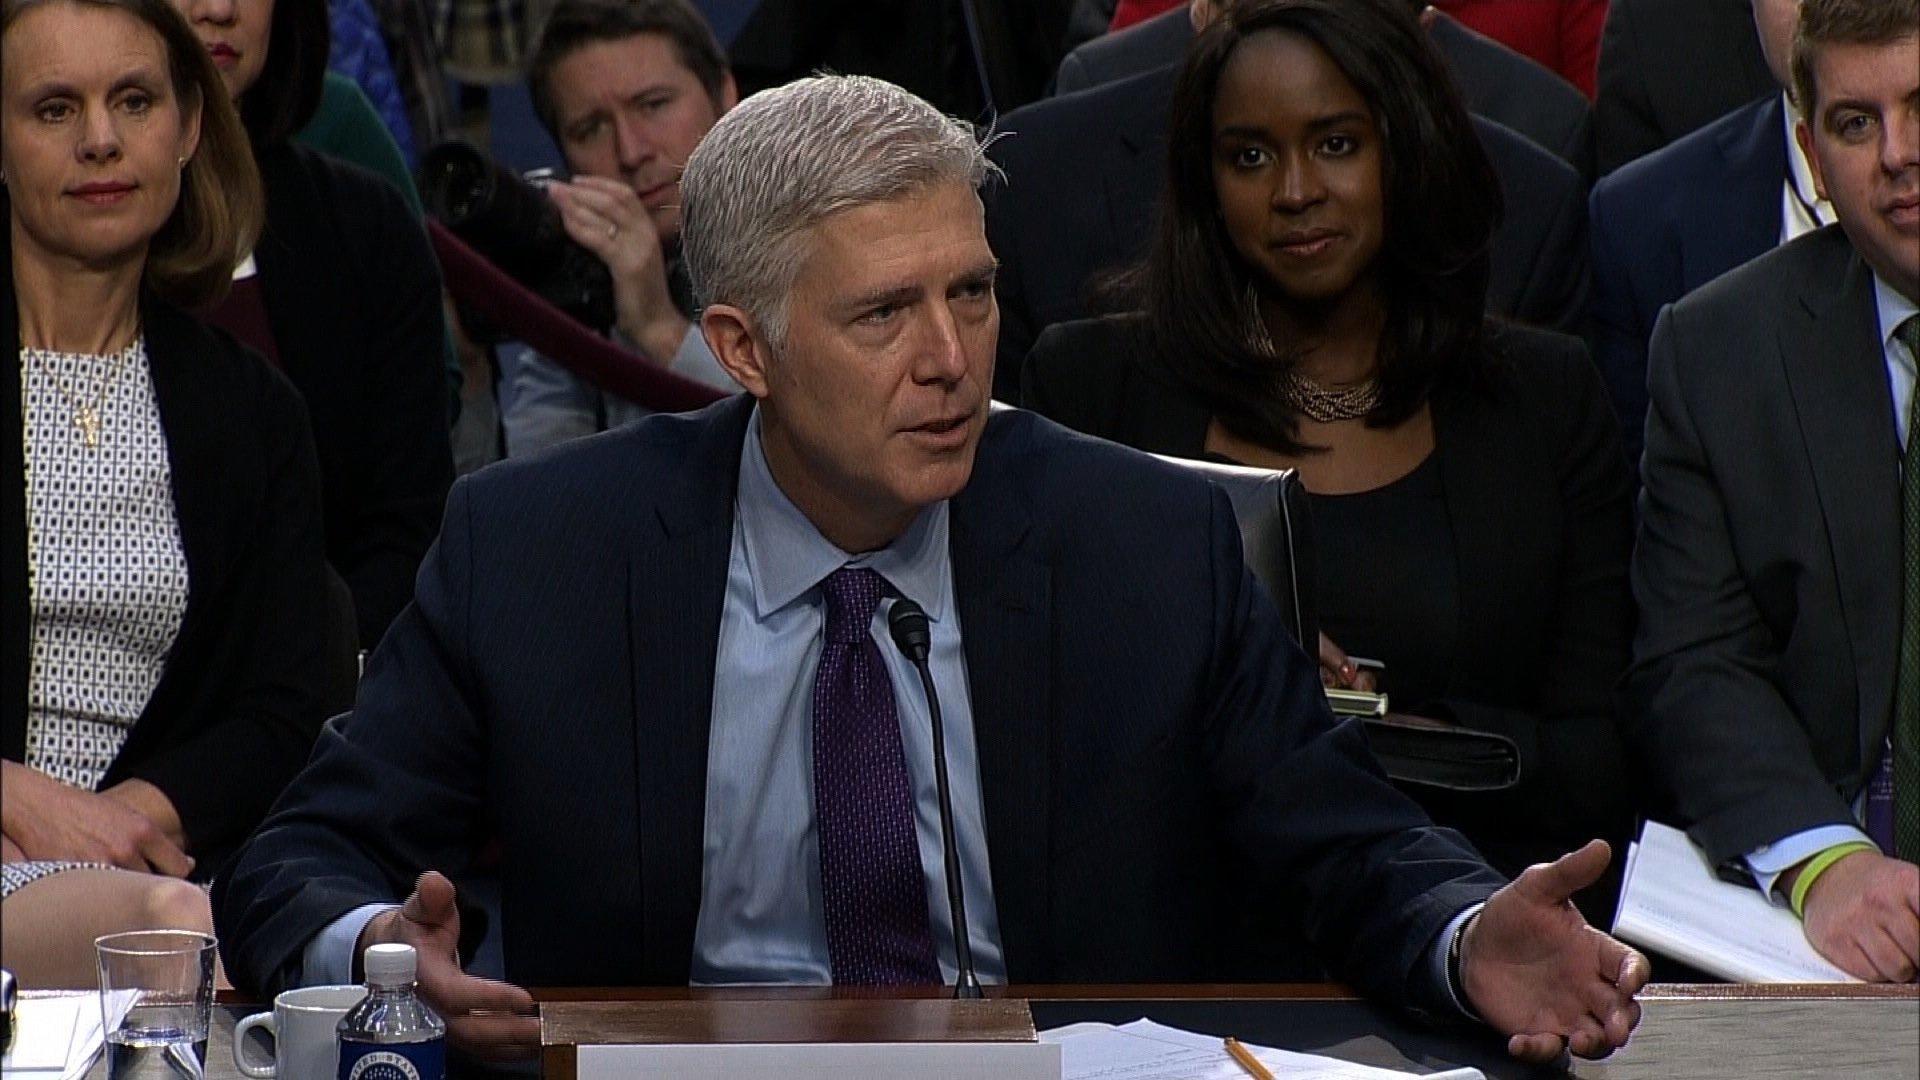 Top Senate Democrat to oppose Trump pick for Supreme Court